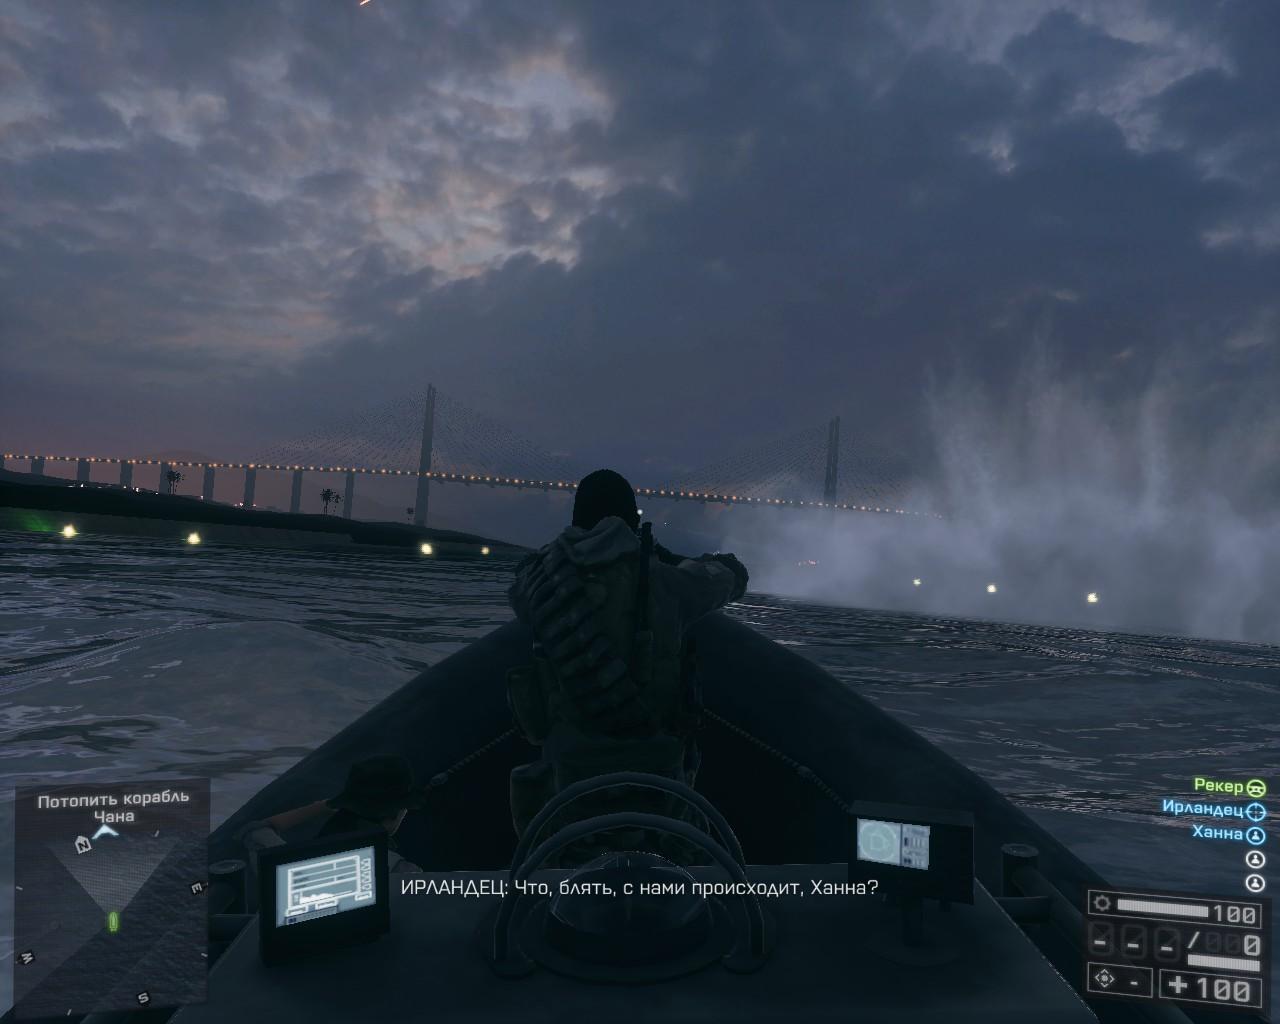 bf4 2014-04-11 18-09-58-07.jpg - Battlefield 4